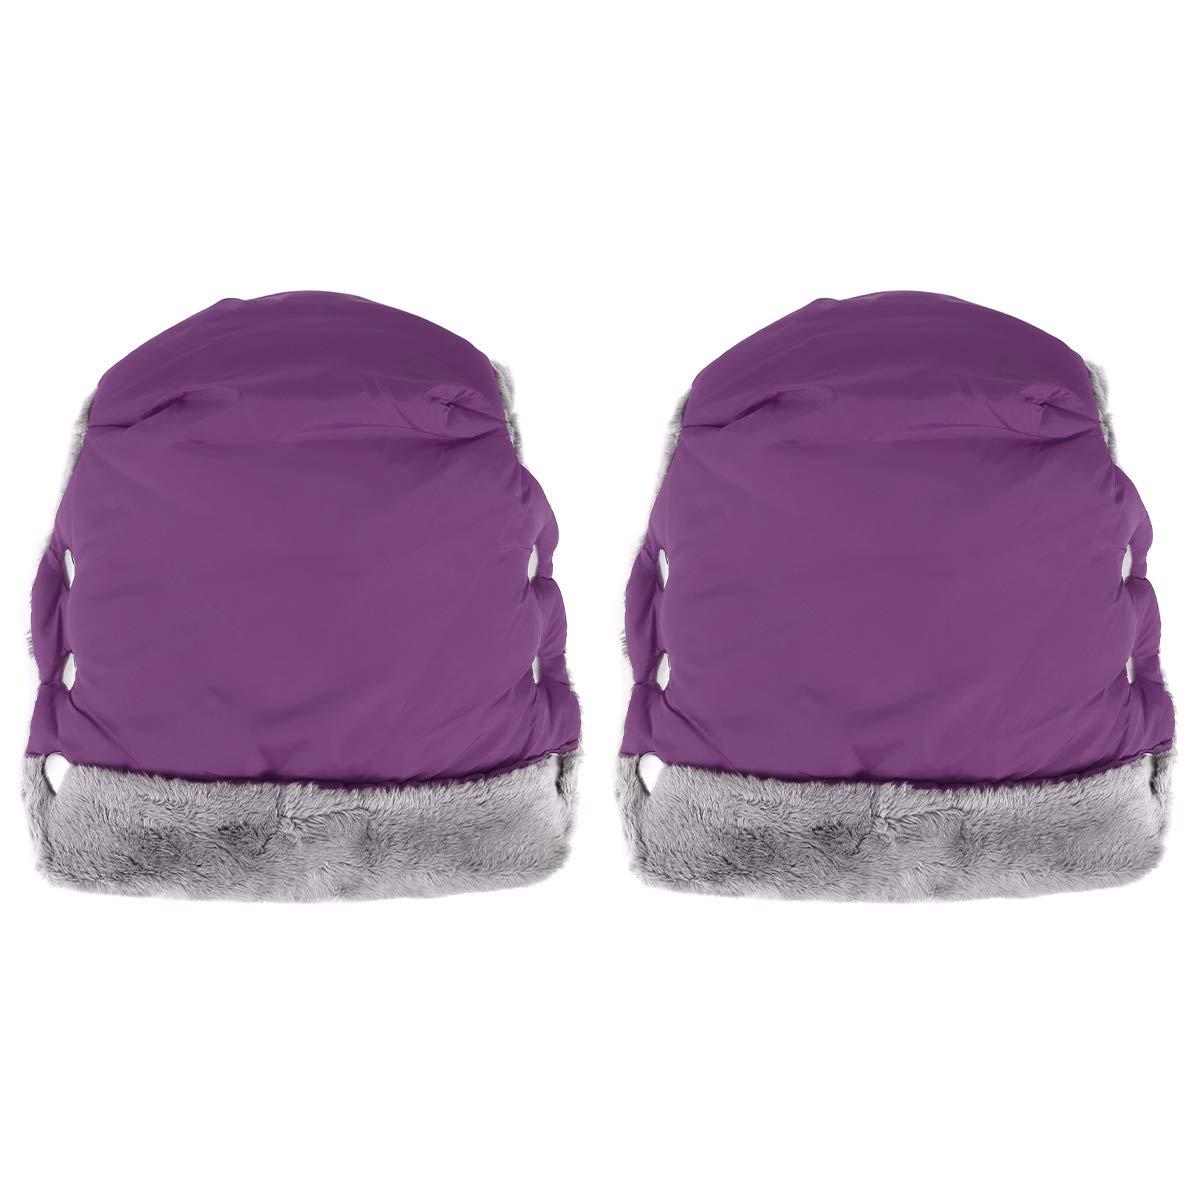 ROSEBEAR Stroller Hand Muff, Winter Waterproof Hand Warmer Baby Stroller Pushchair Mittens with Universal Fit